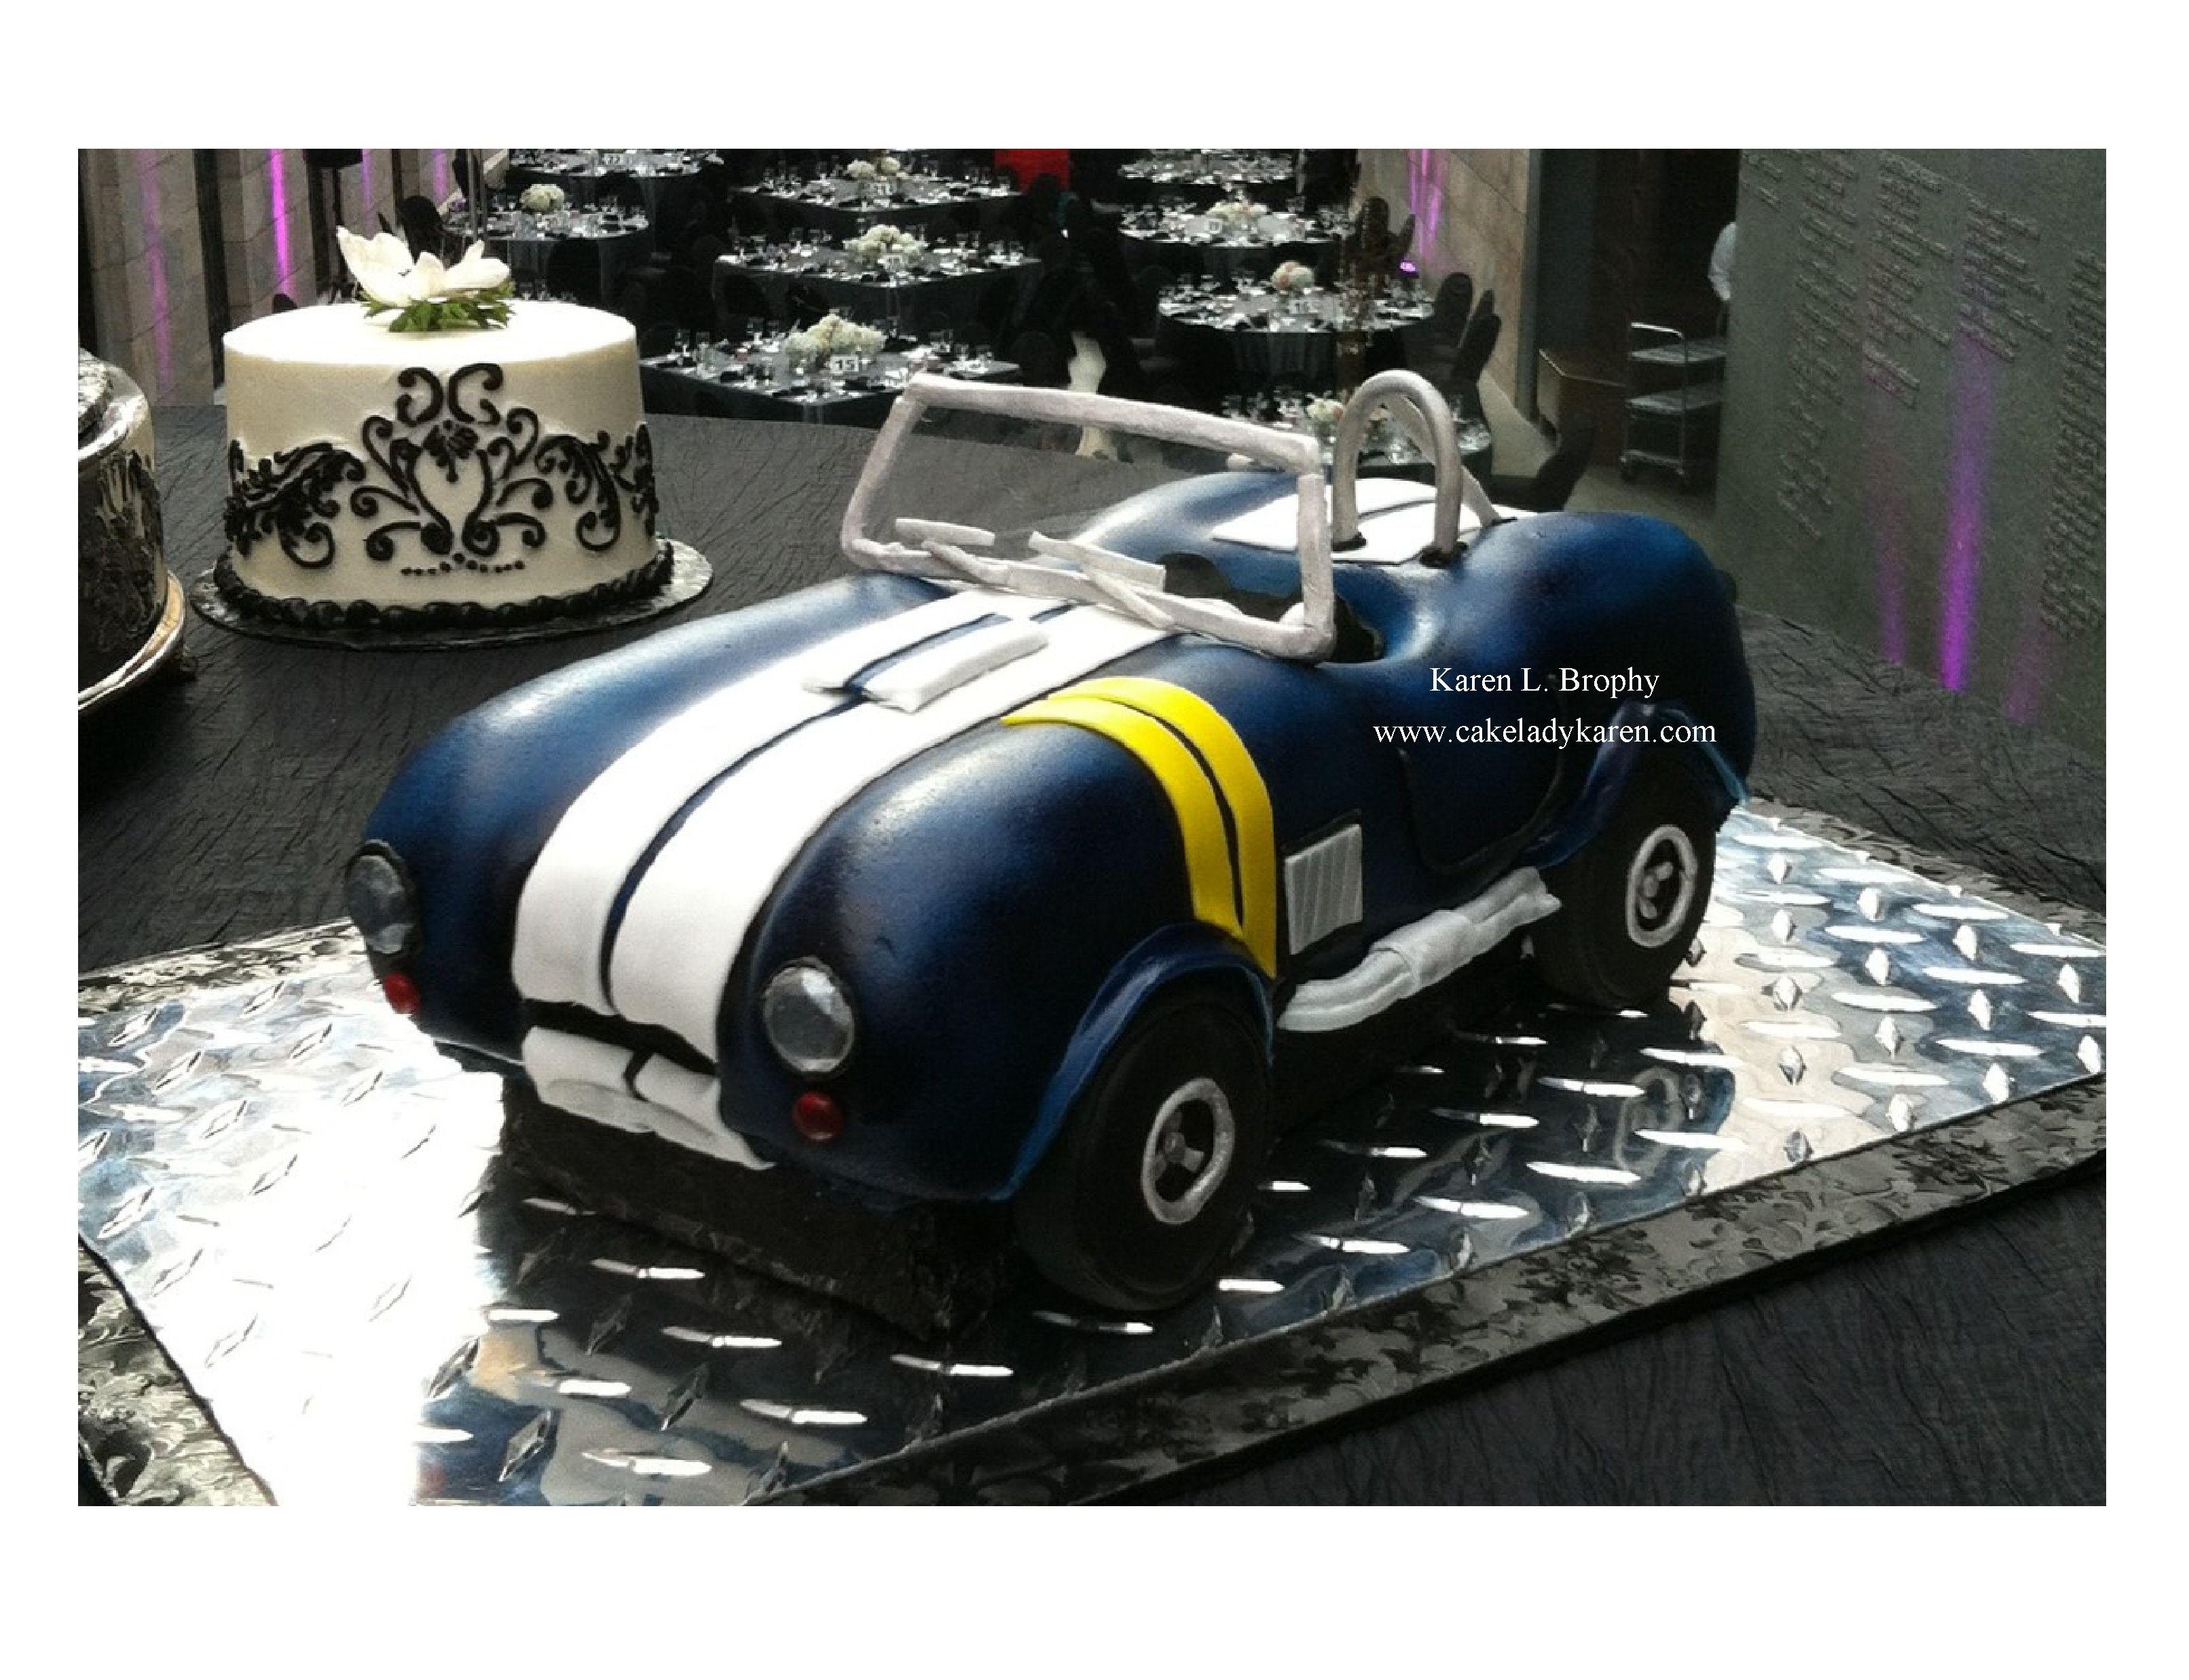 Shelby Cobra Grooms Cake Karen L Brophy Wedding Cake Designer www